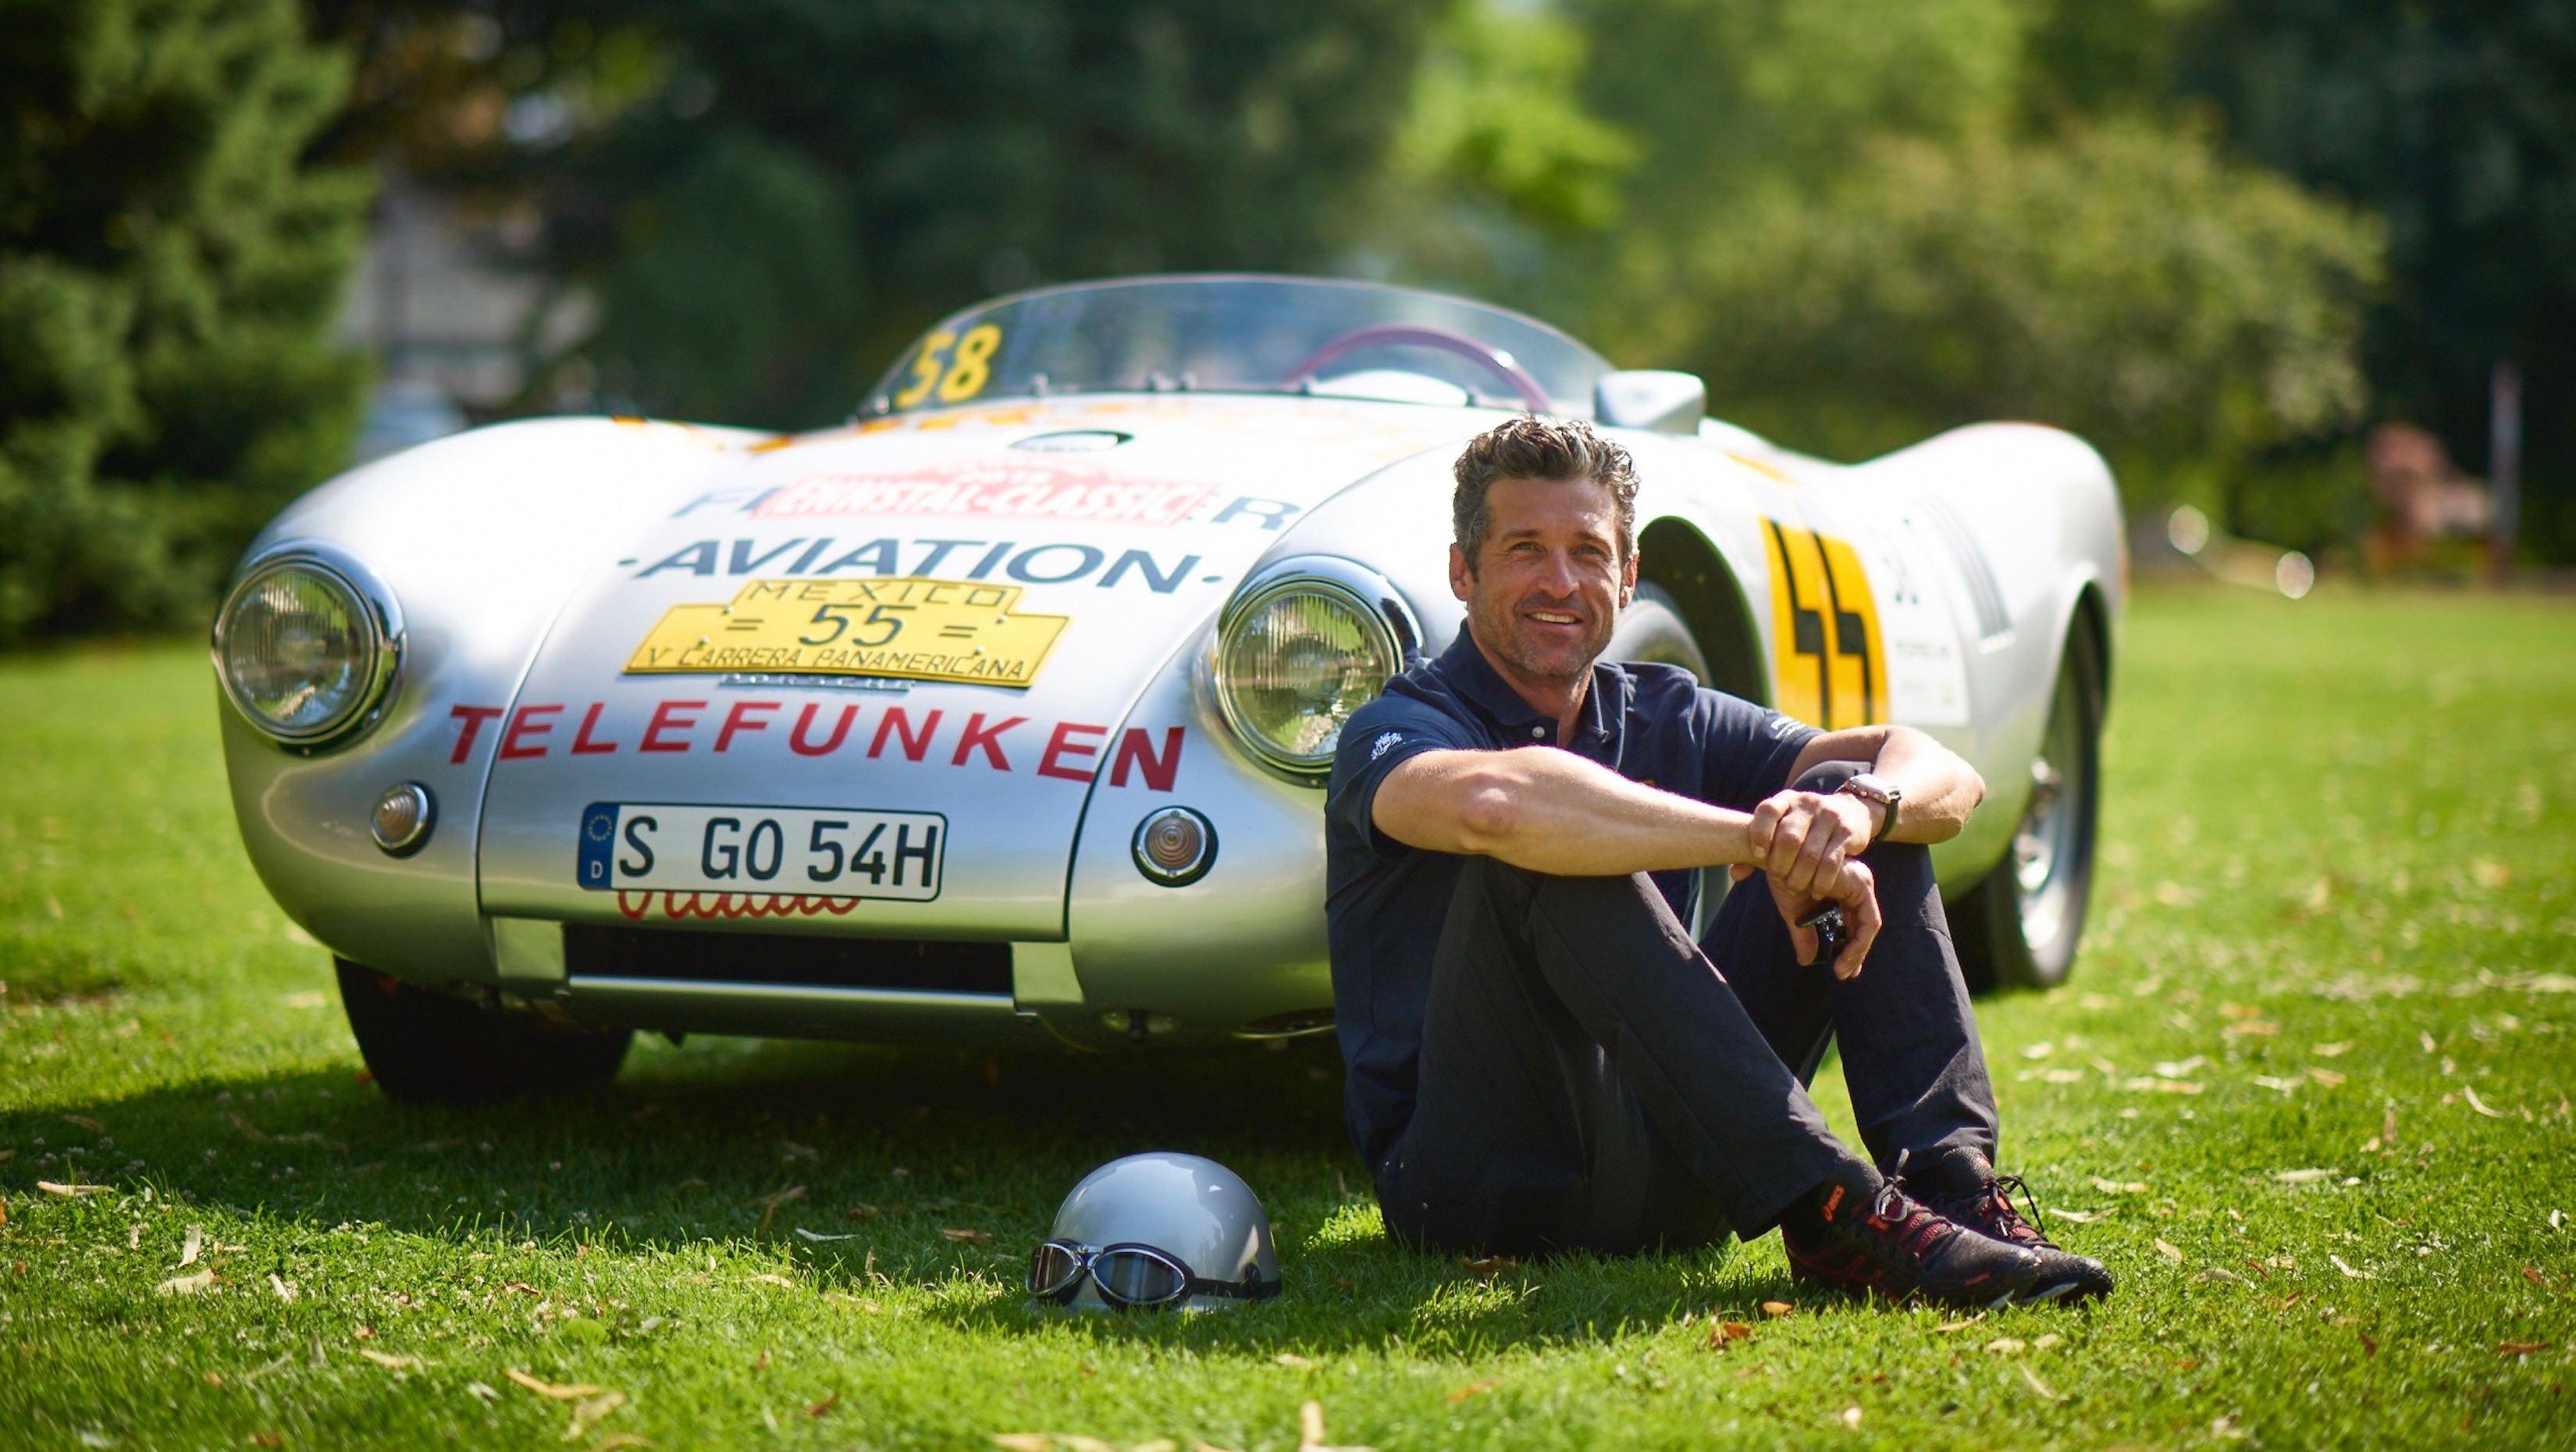 356 Speedster 1500 Patrick Dempsey